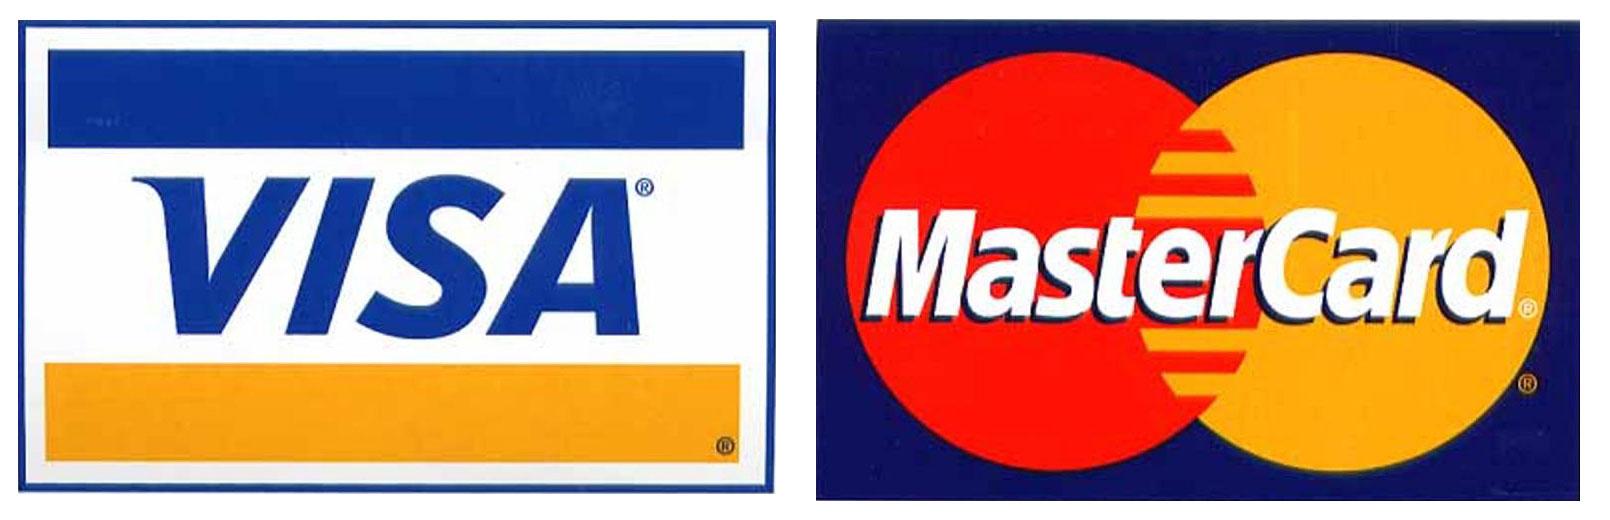 Master visa card logo